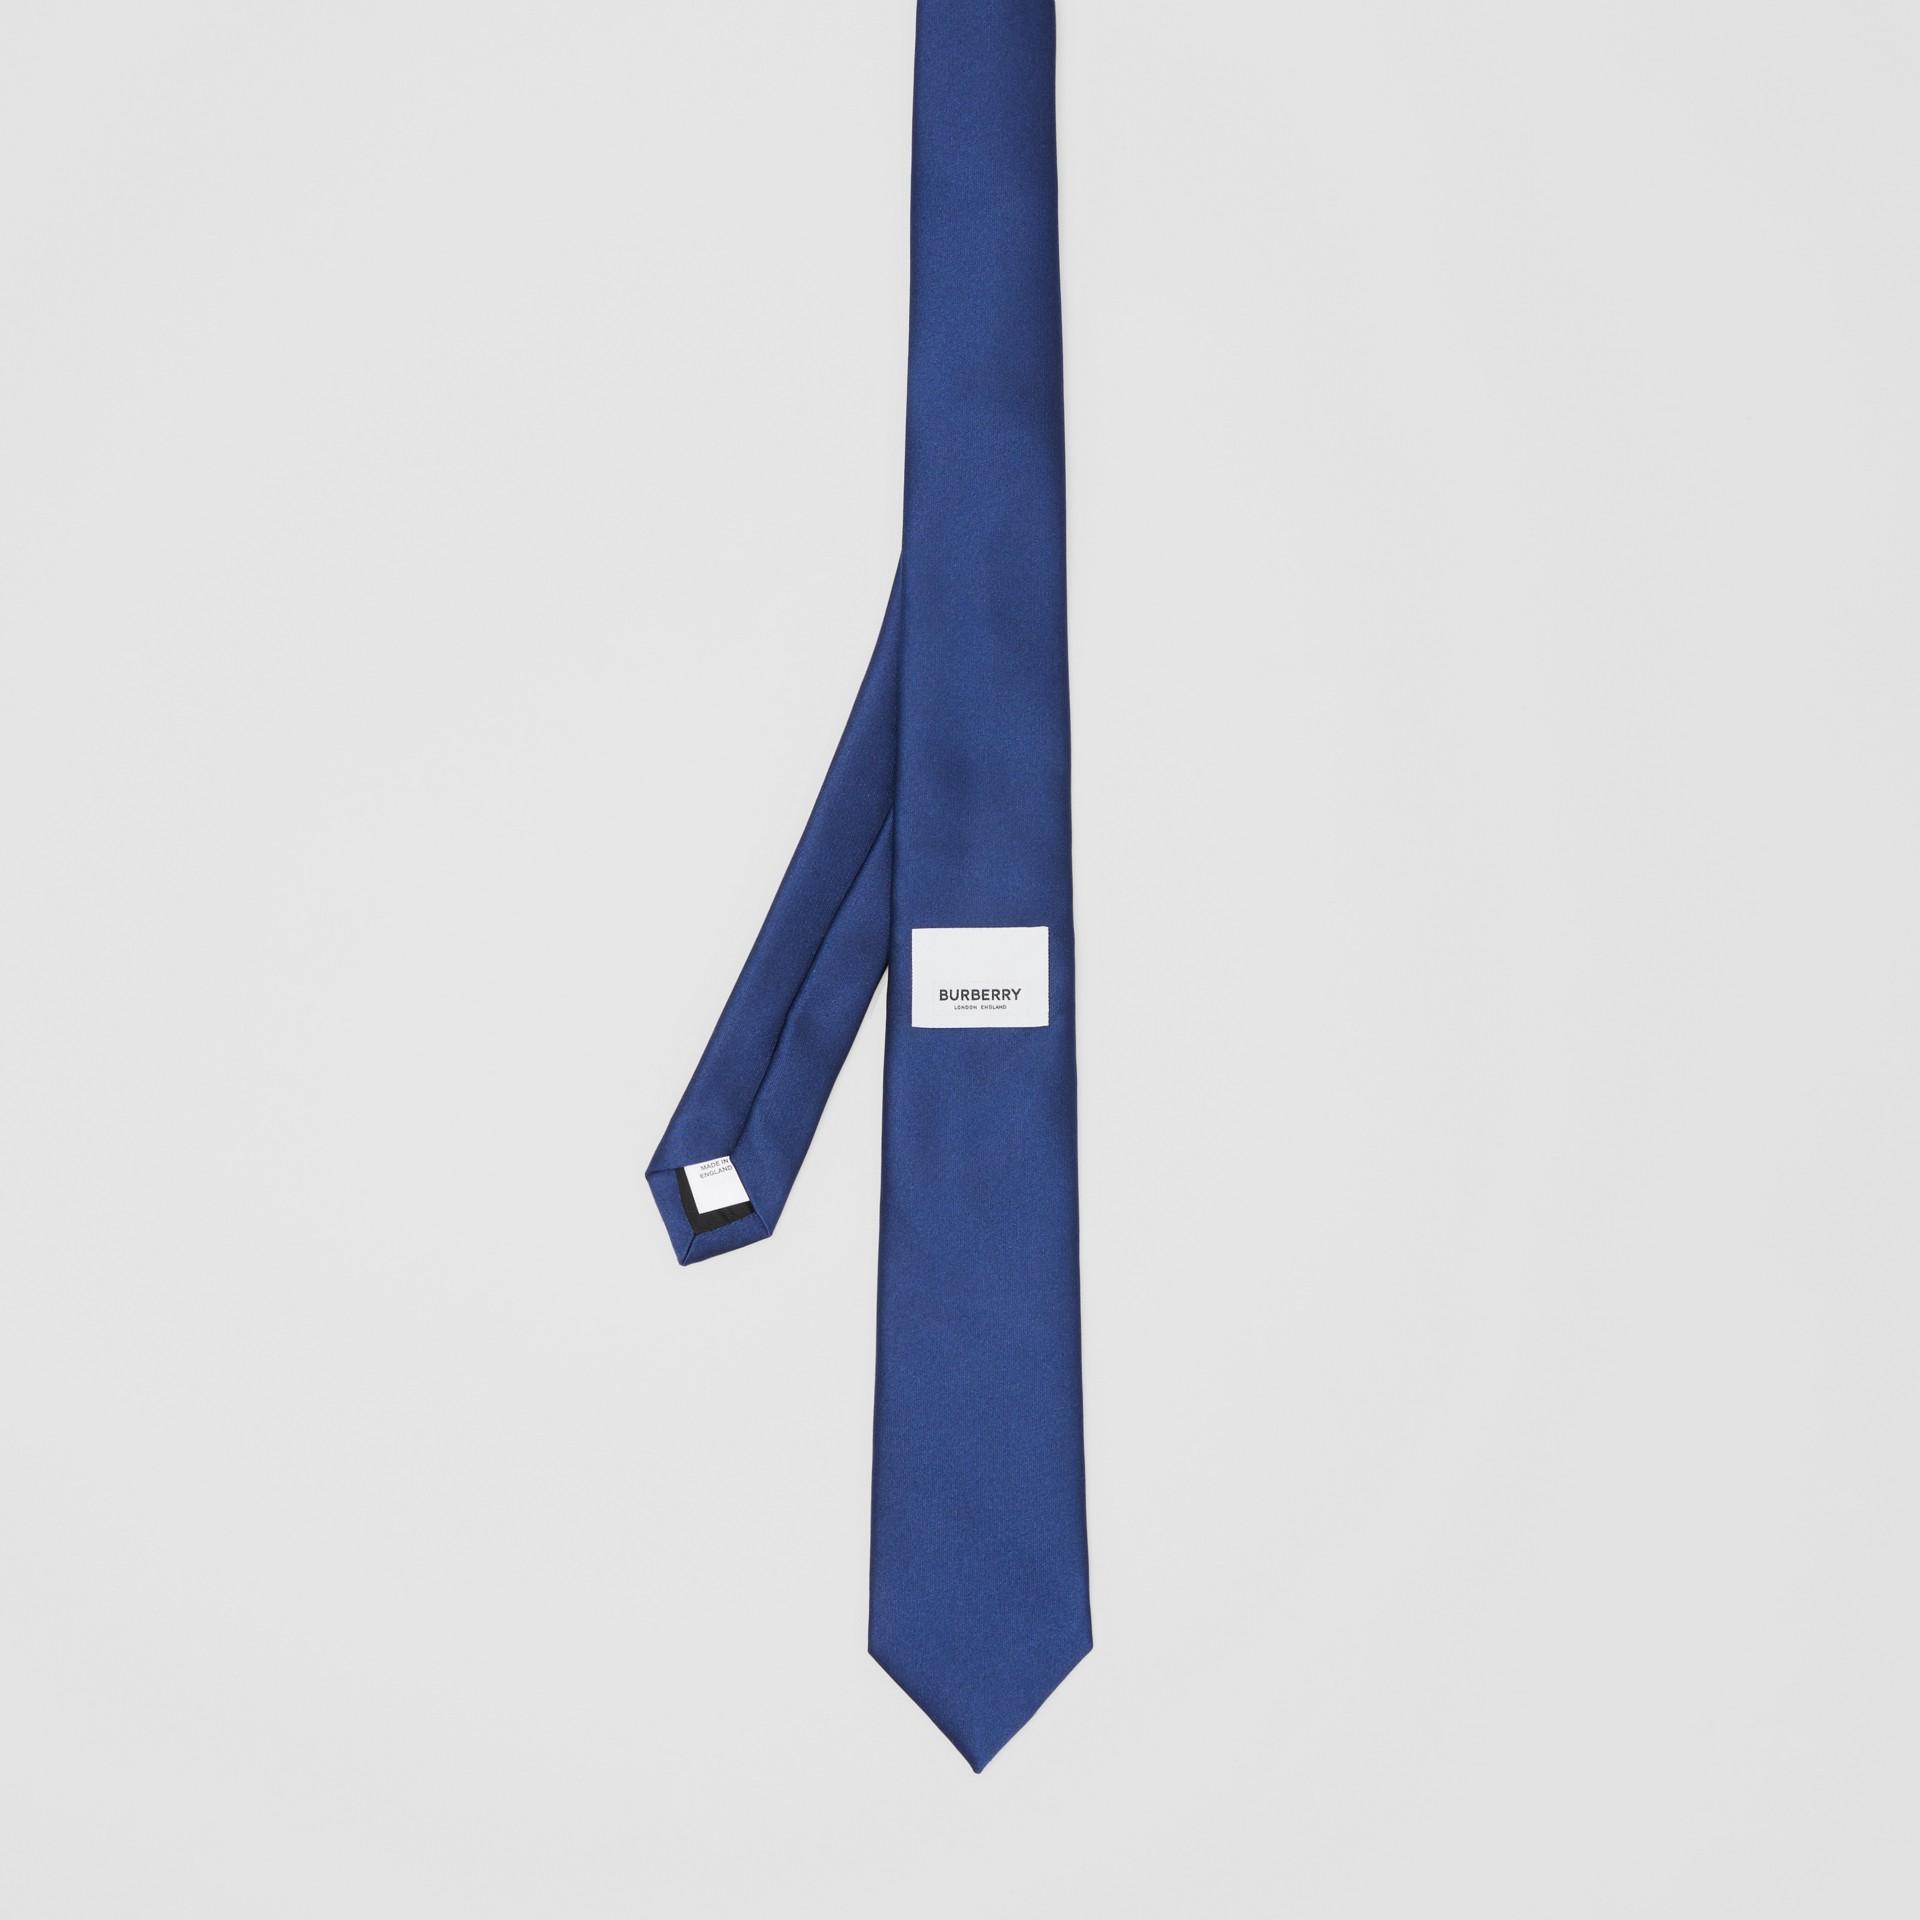 Classic Cut Logo Appliqué Silk Satin Tie in Sapphire Blue - Men | Burberry - gallery image 4